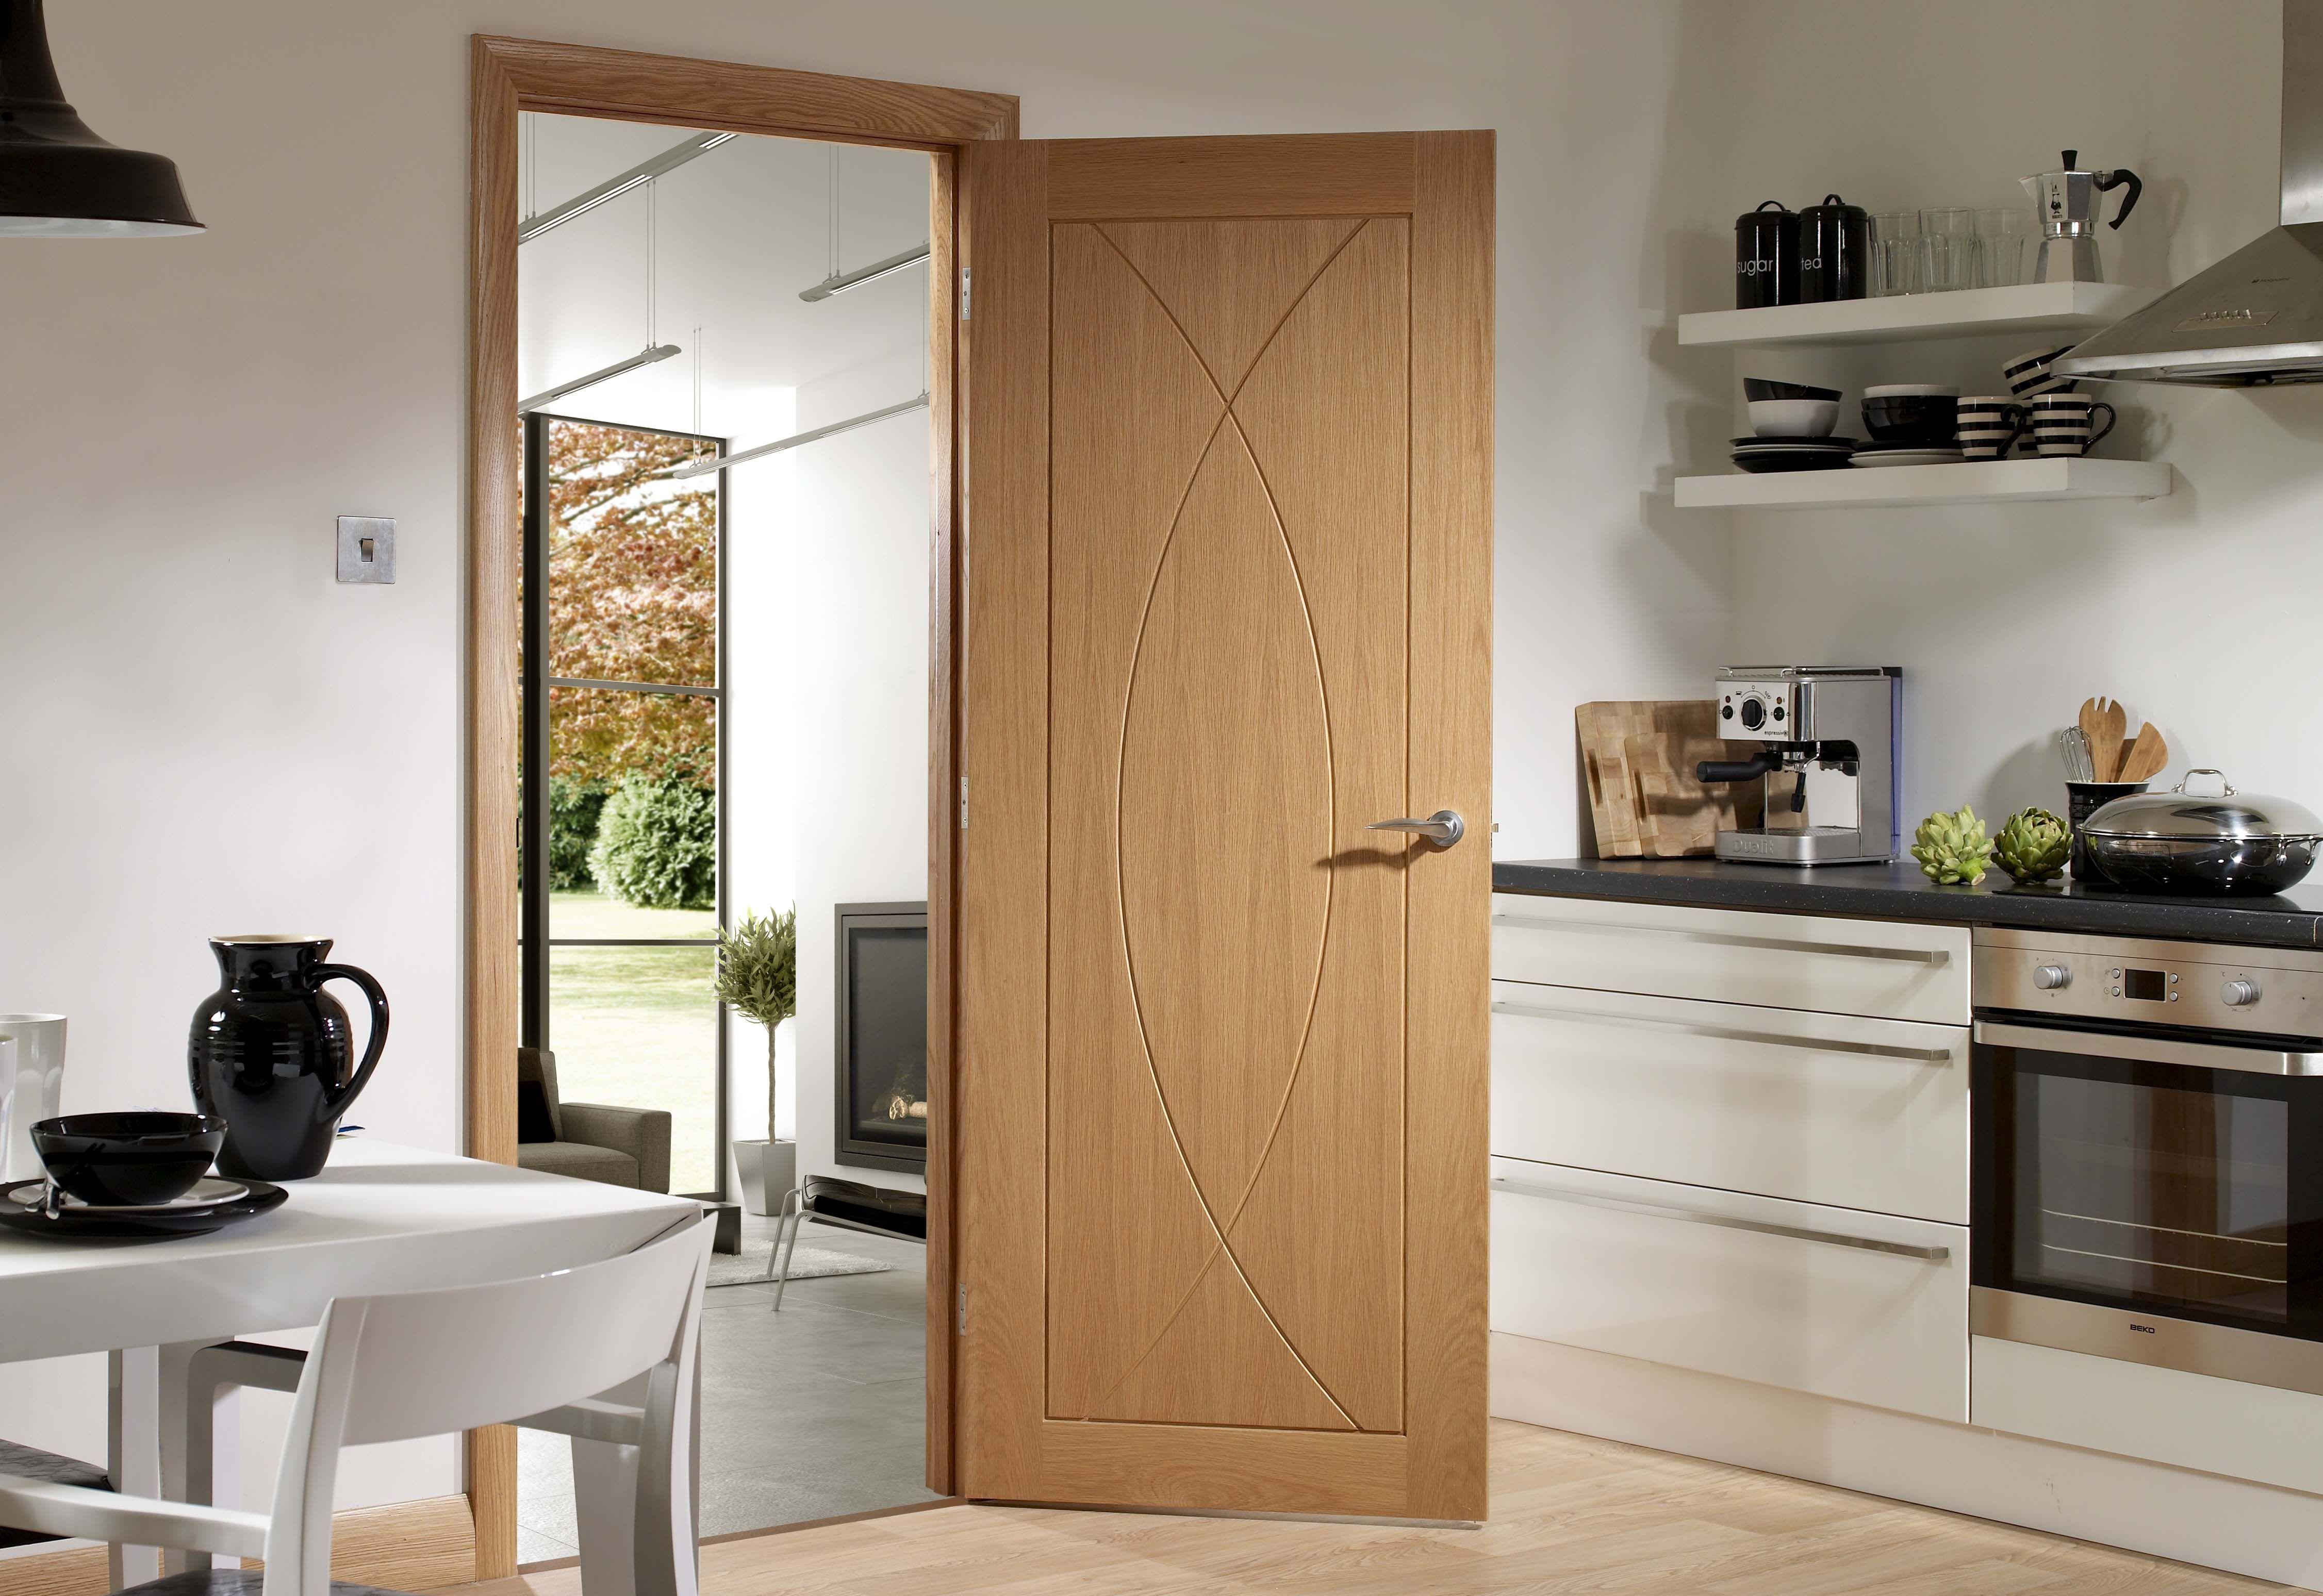 Modern oak unpolished swing interior door design with floating shelf